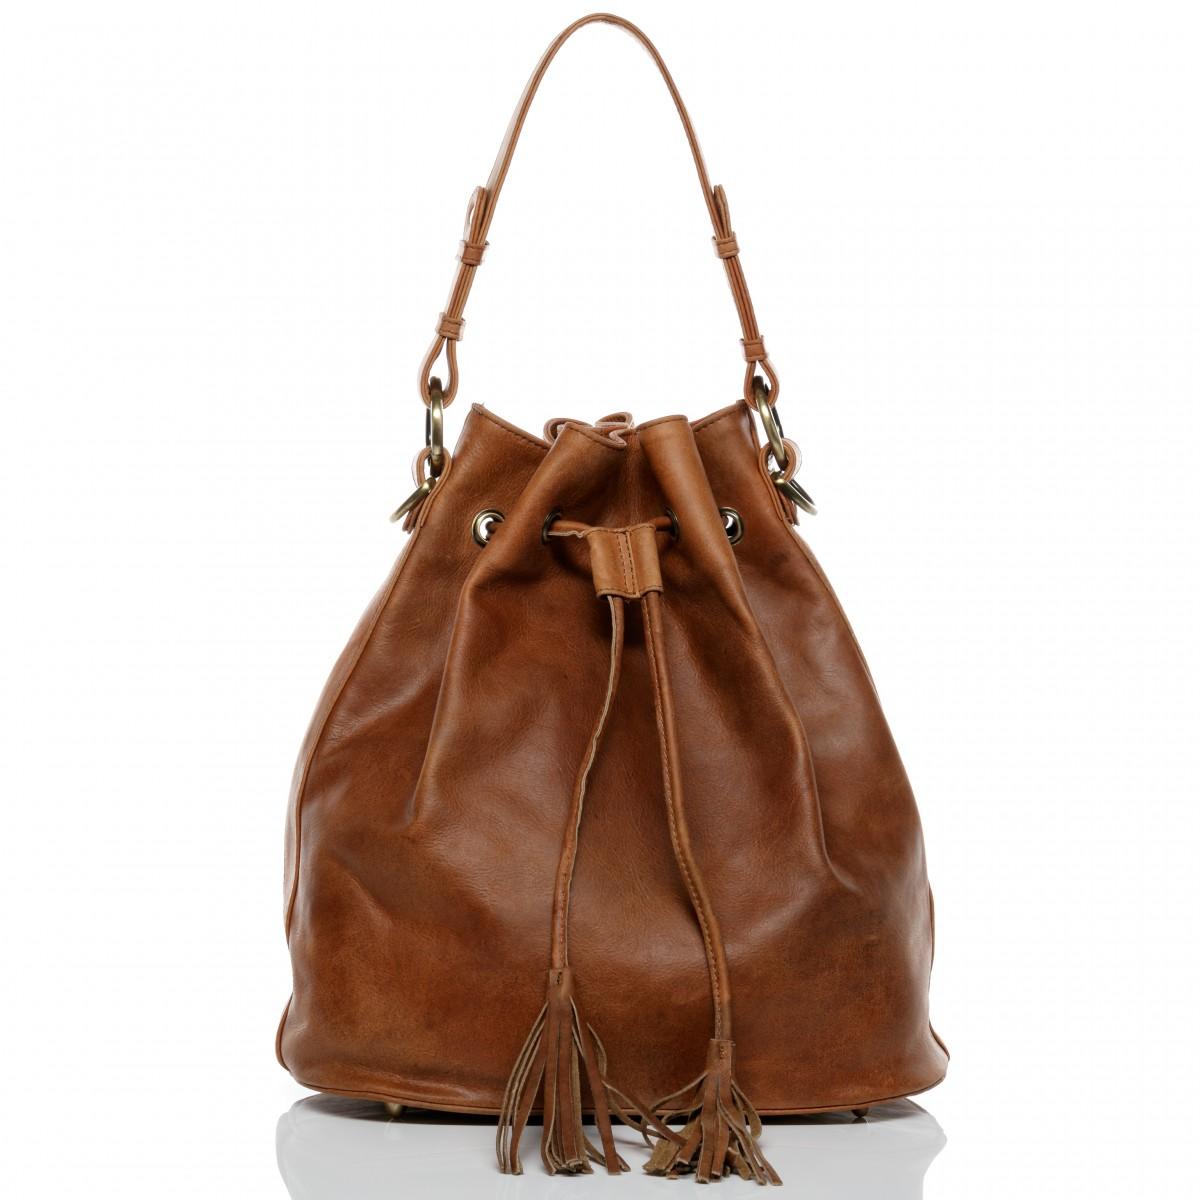 f77882dad1245 BACCINI® Beuteltasche ELISA - Damen Schultertasche groß Ledertasche - Hobo  Bag Damentasche echt Leder schwarz